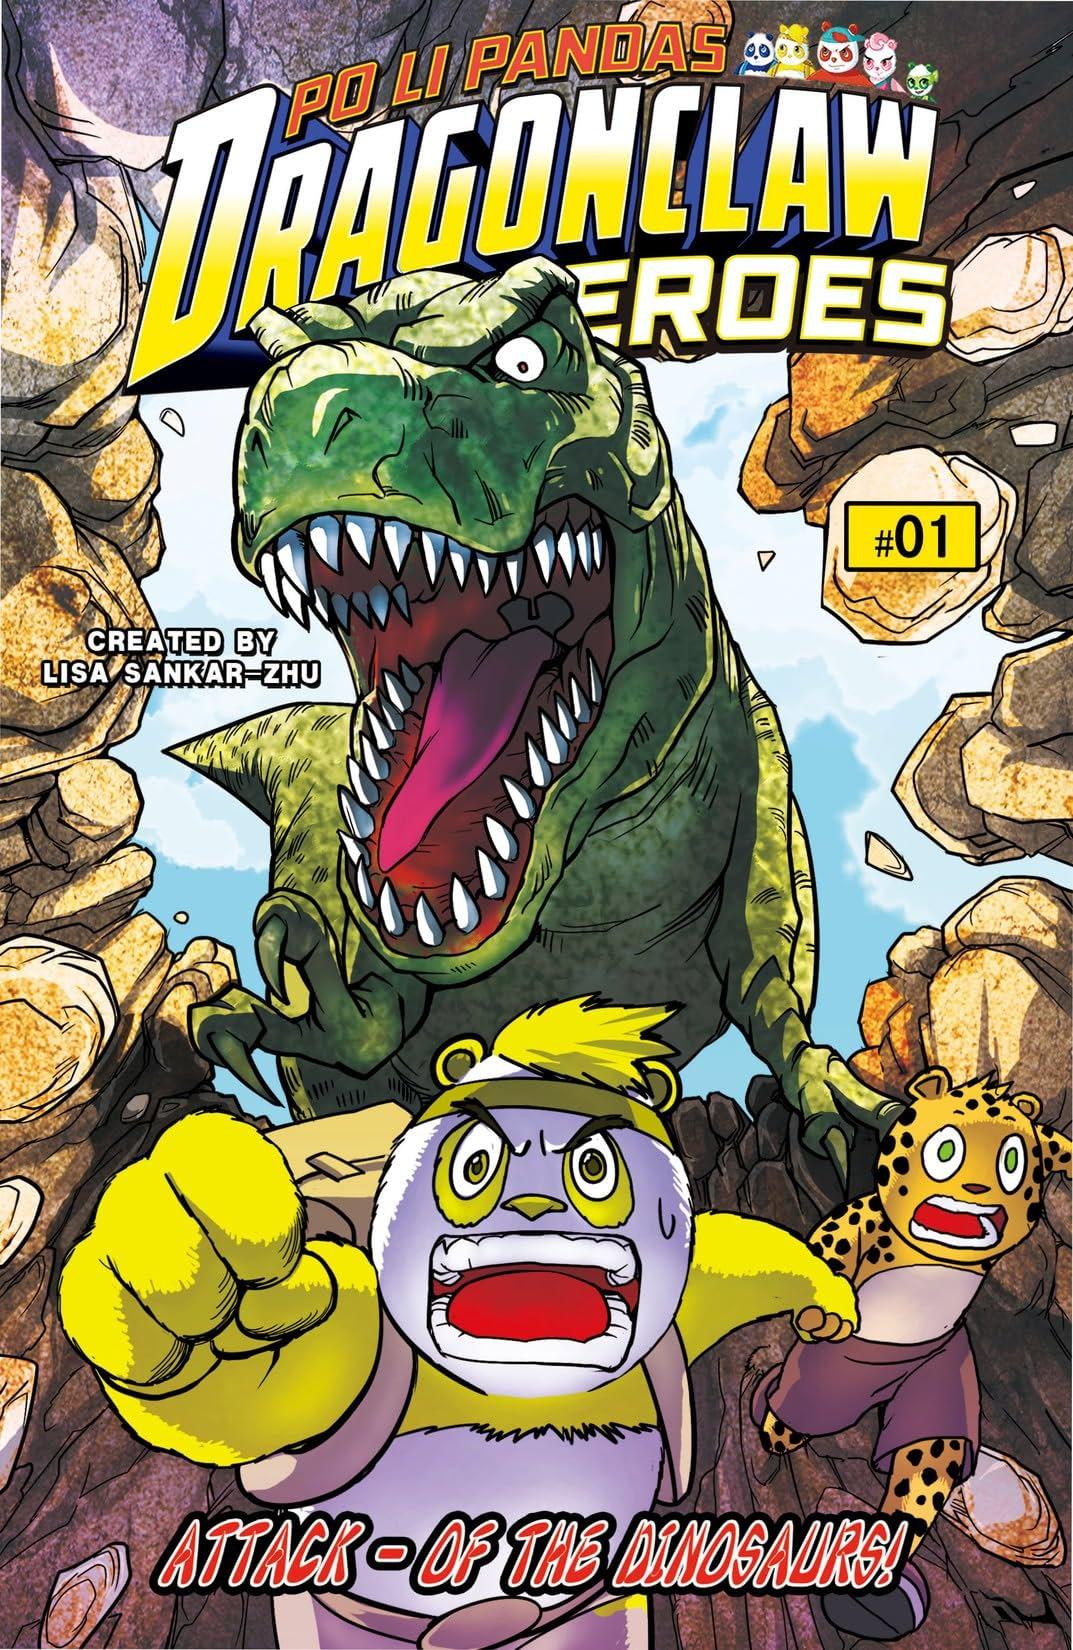 Po Li Pandas Dragon Claw Heroes #1